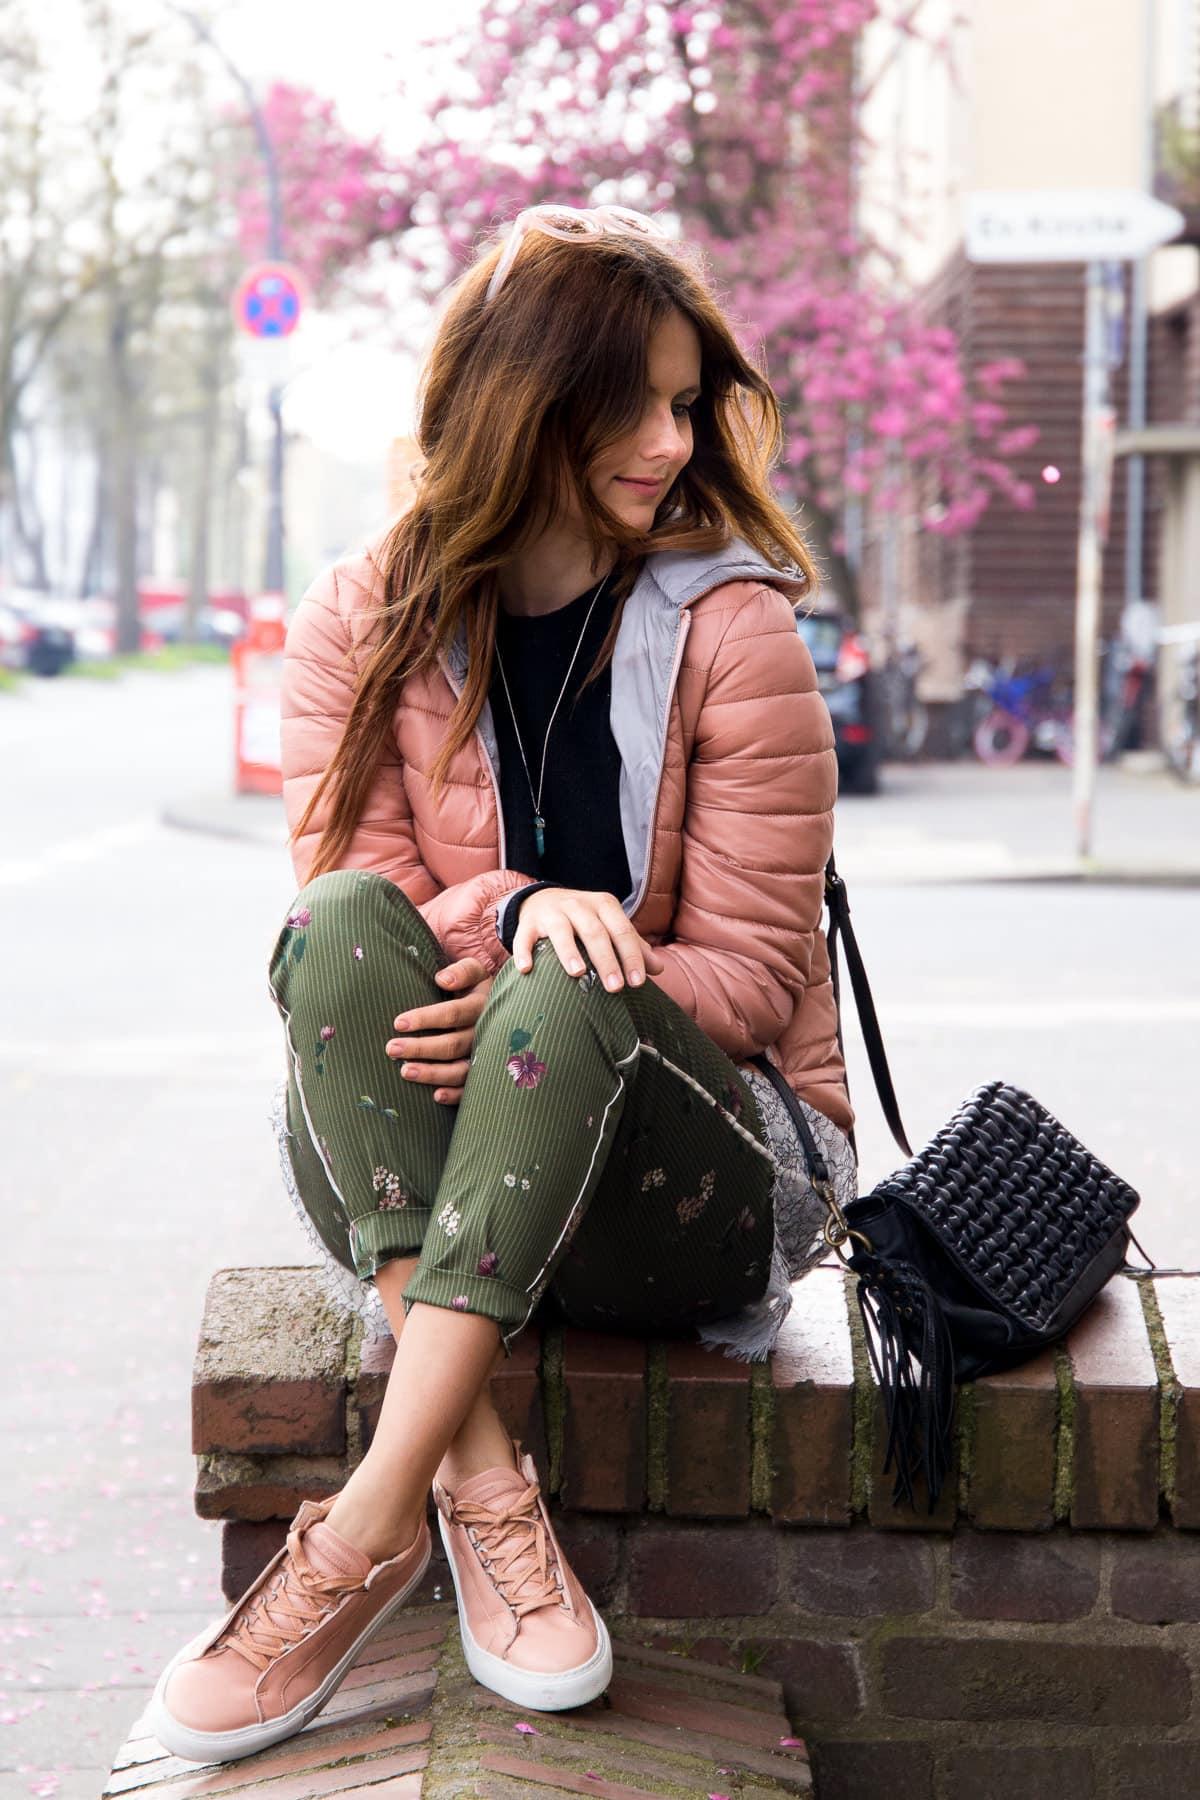 fruehling-in-koeln-kswiss-sneakers-daunenjacke-layering-look-fashion-blog-des-belles-choses-11